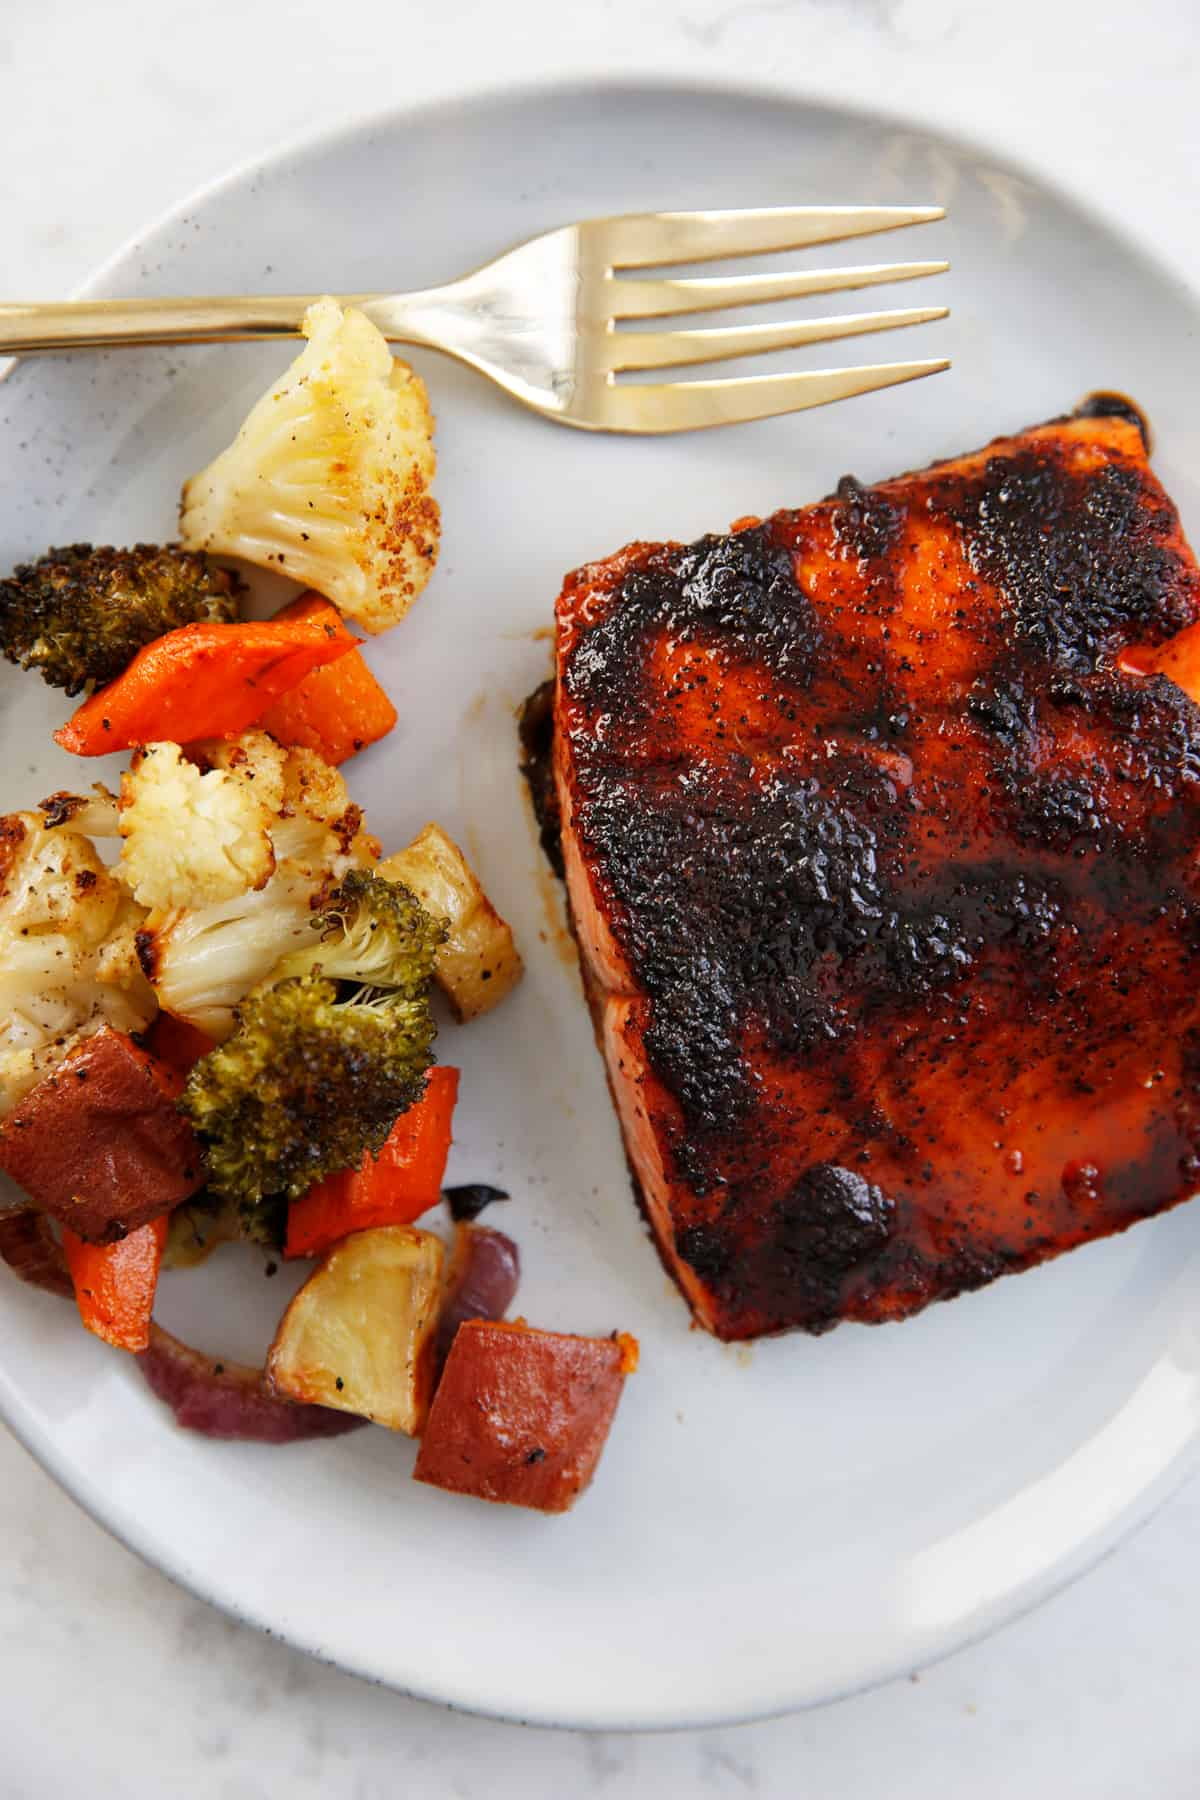 Maple glazed salmon with veggies